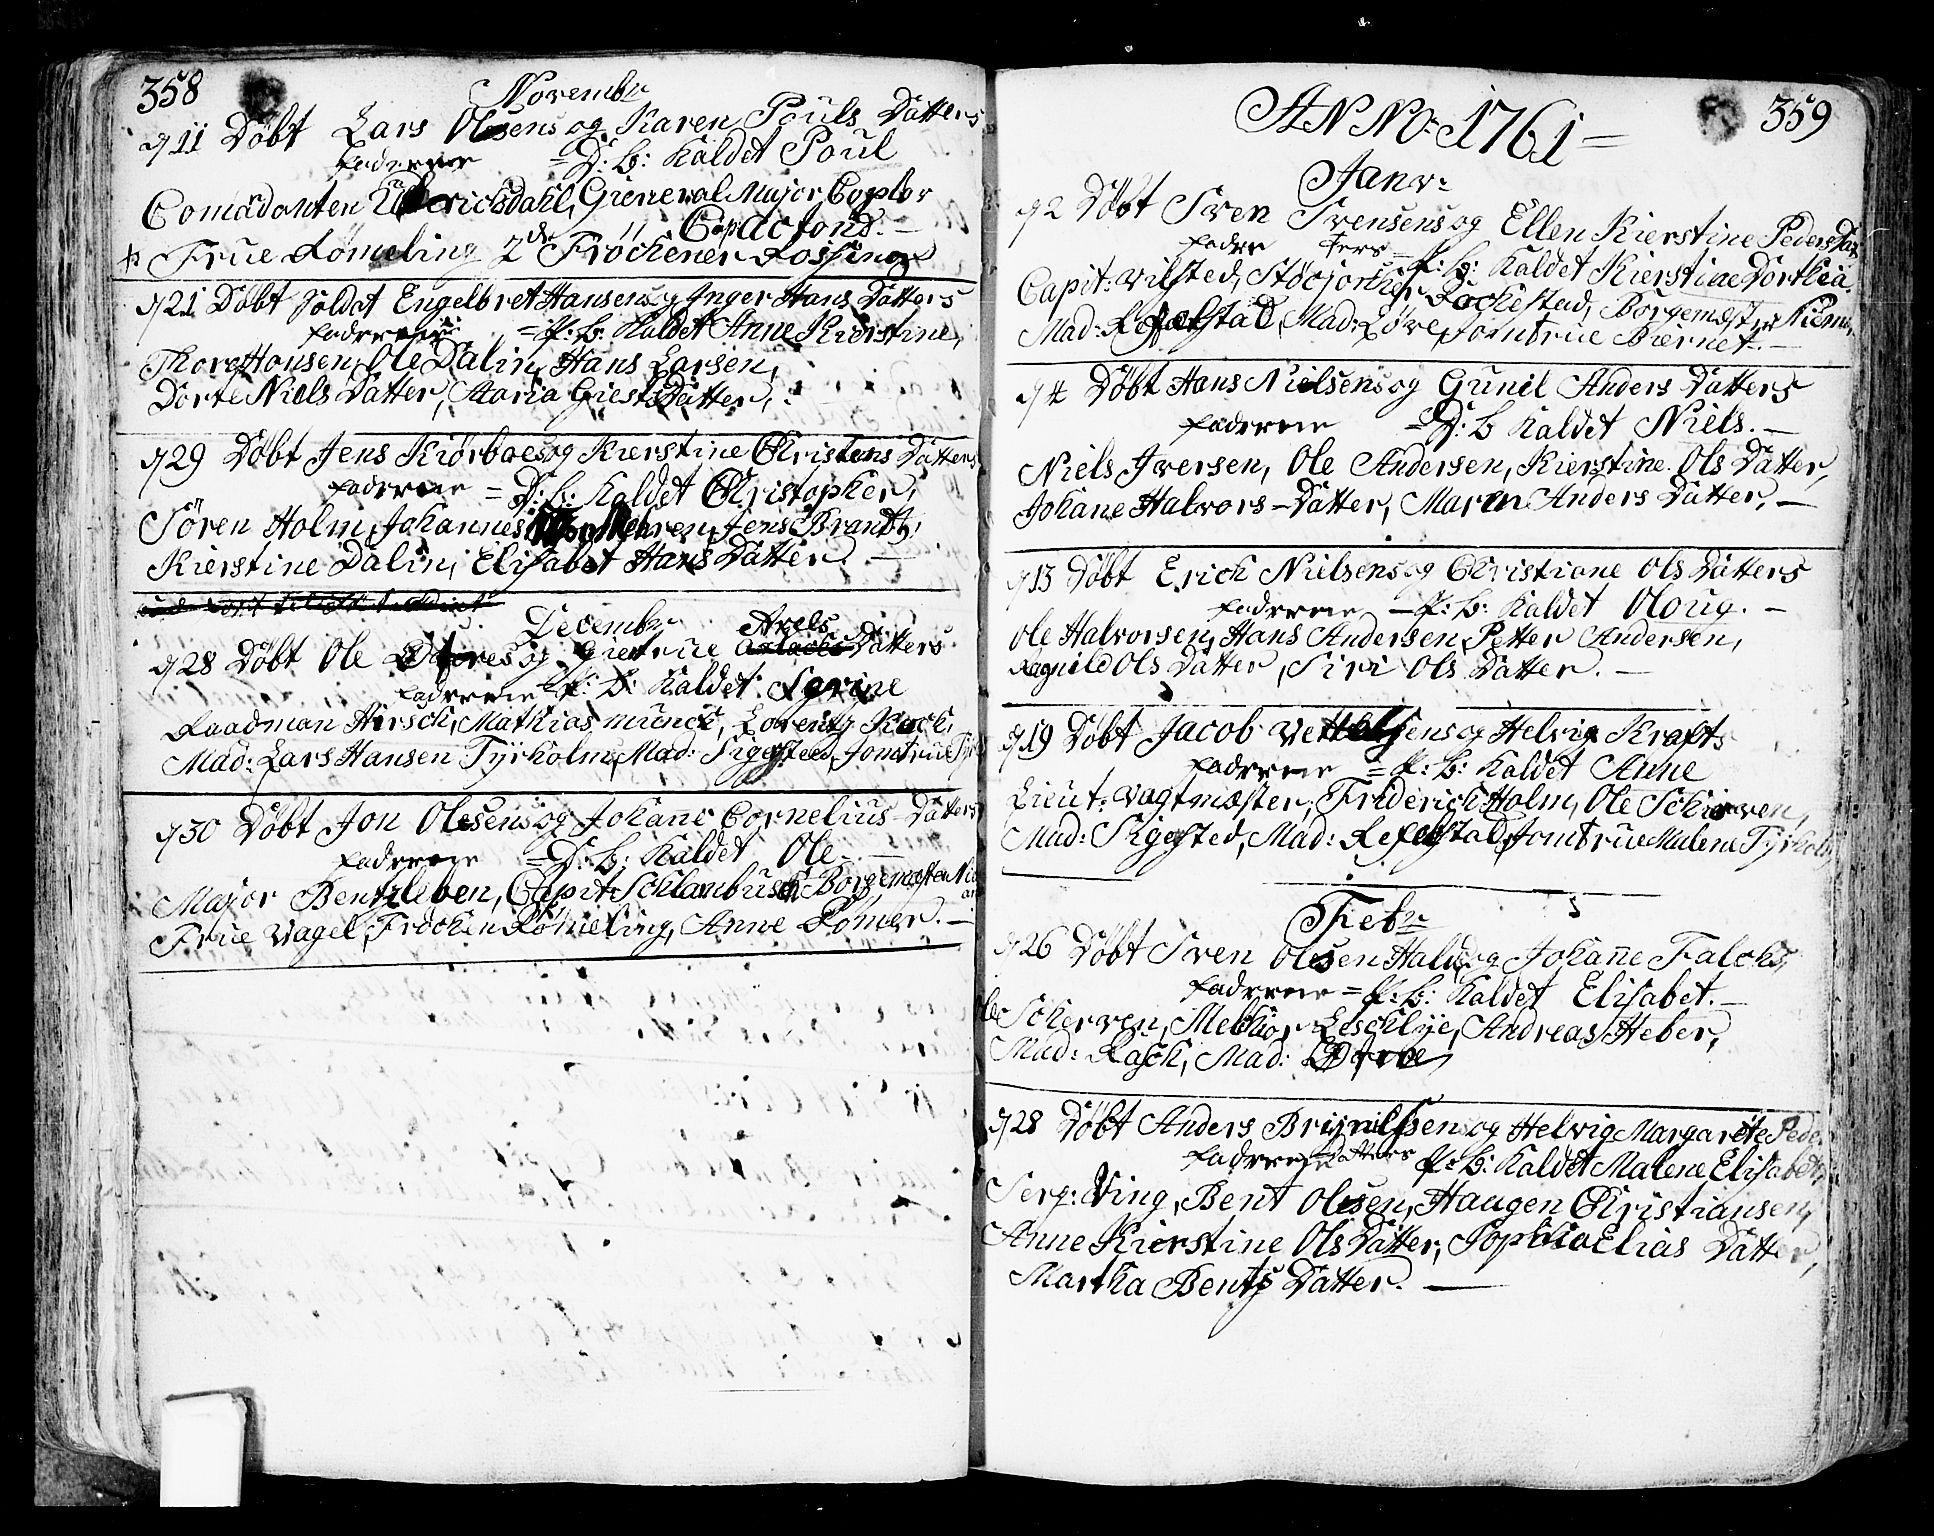 SAO, Fredrikstad prestekontor Kirkebøker, F/Fa/L0002: Ministerialbok nr. 2, 1750-1804, s. 358-359